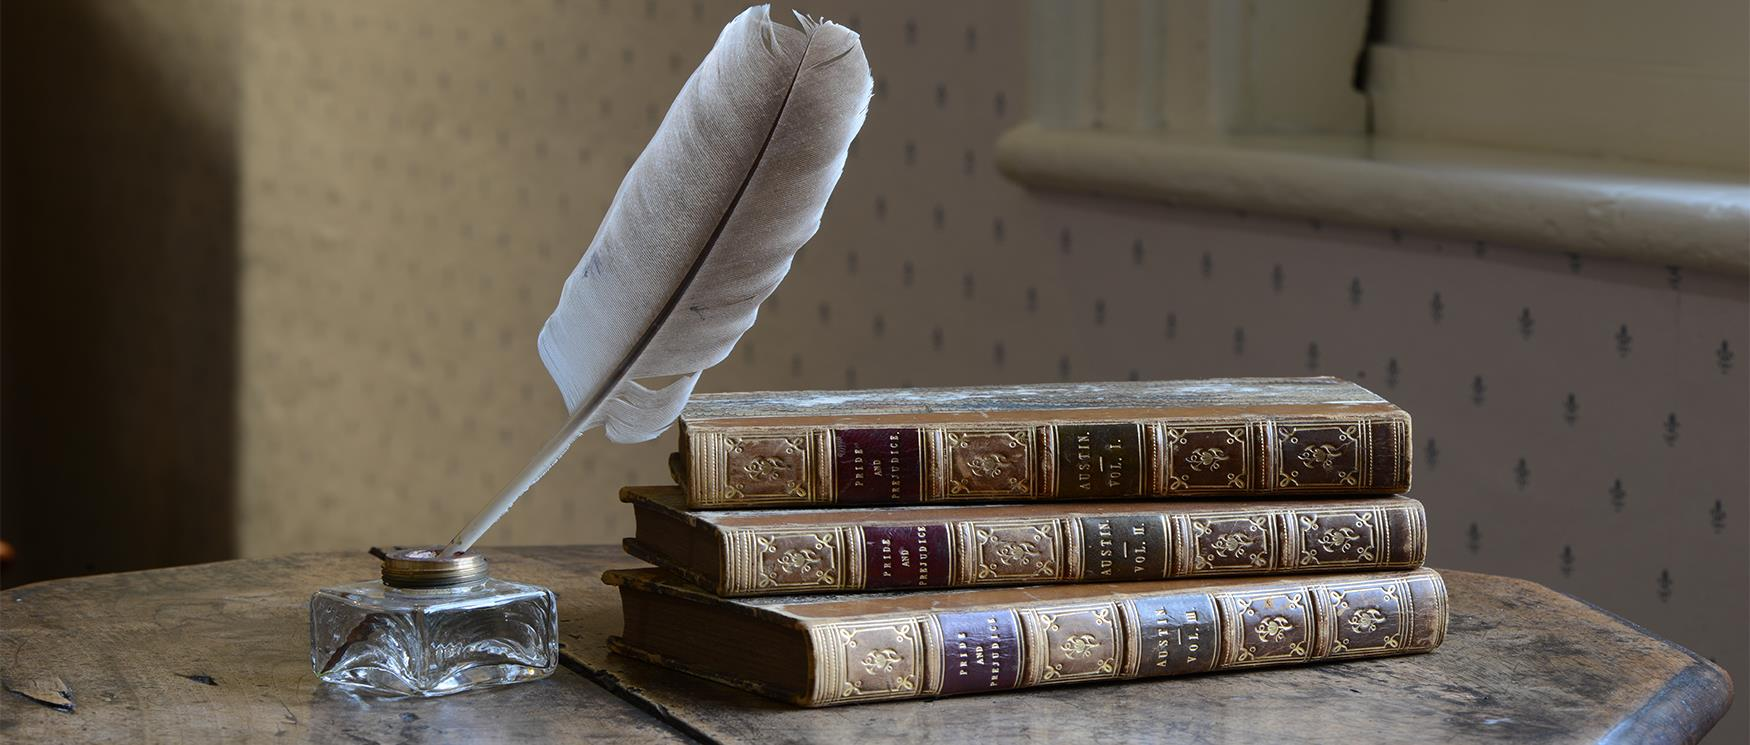 Jane Austen's Desk